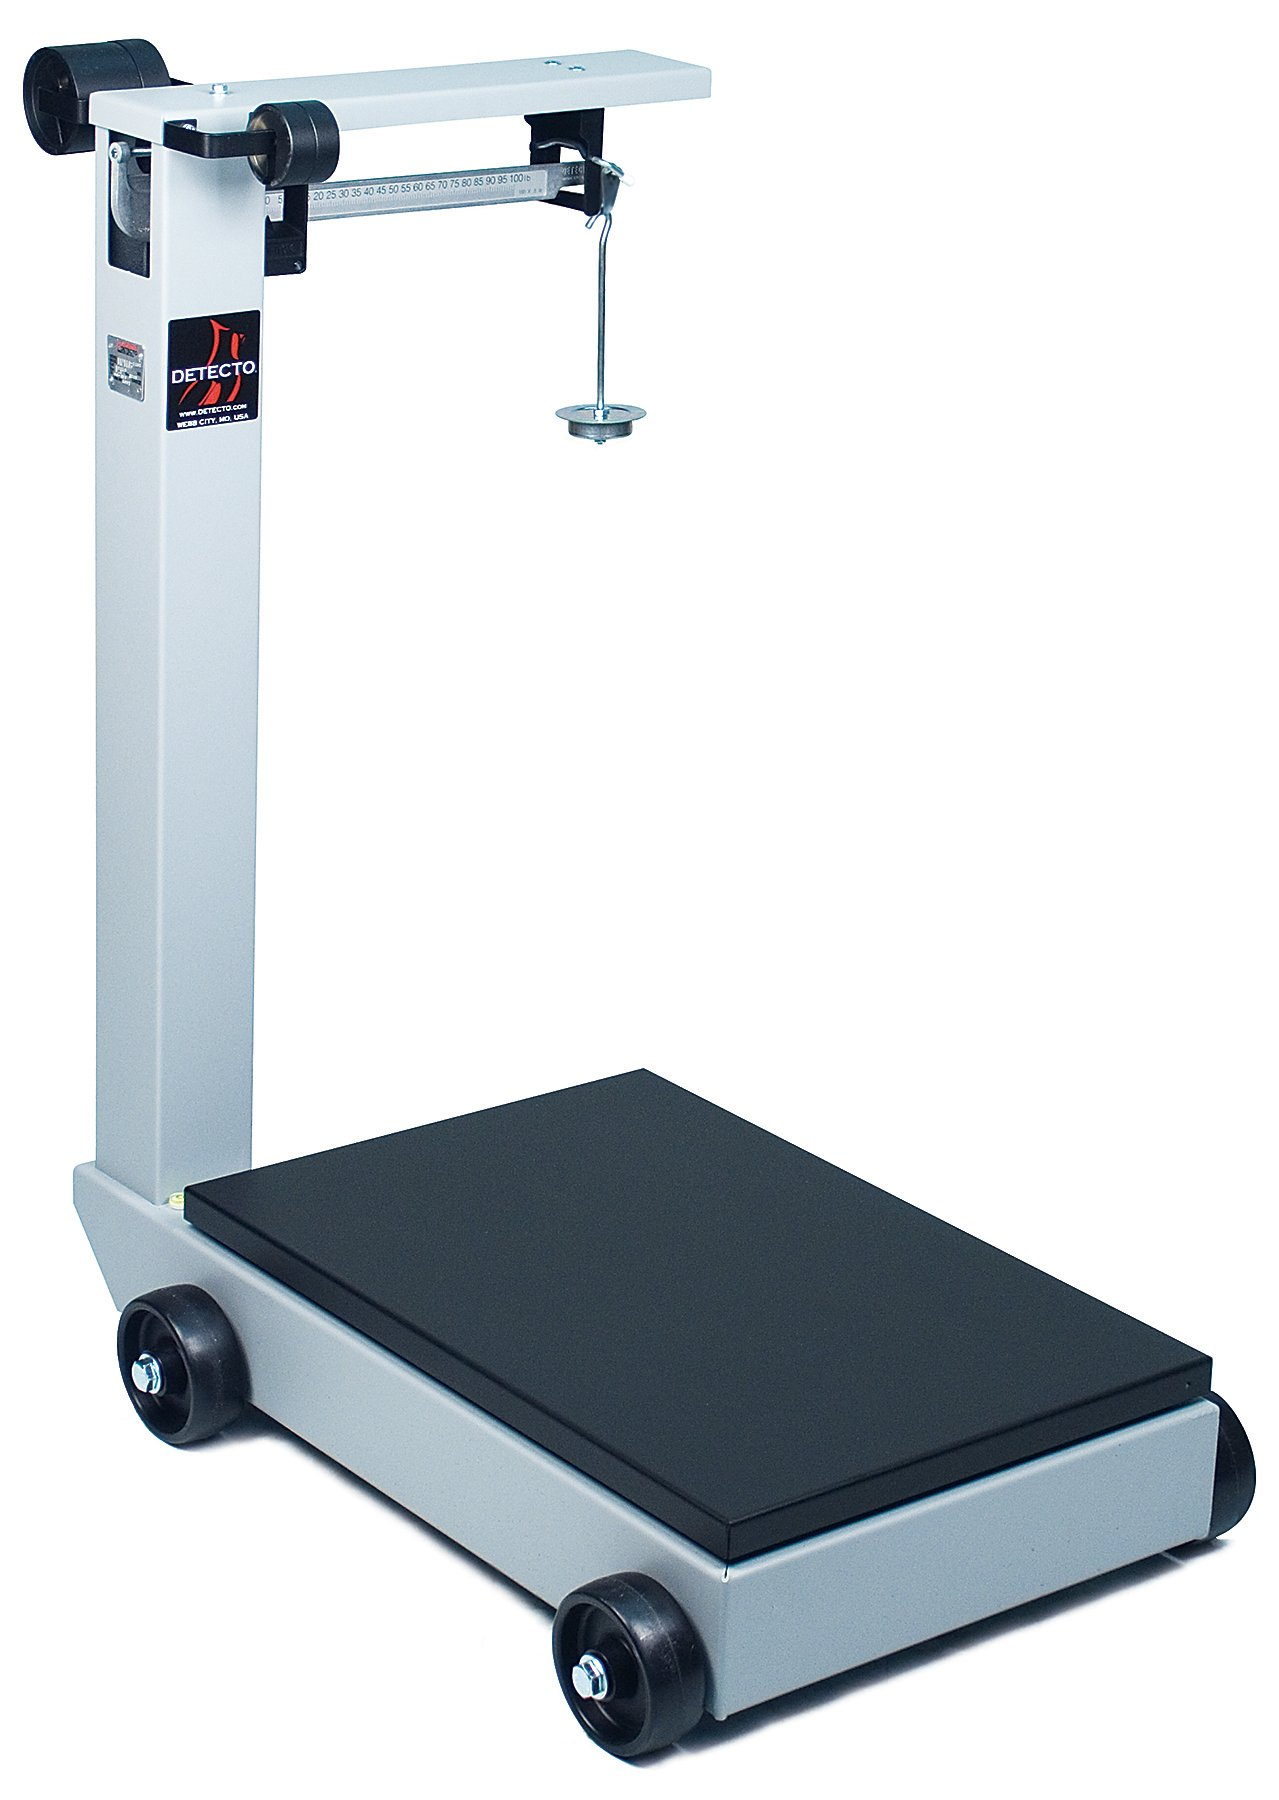 Detecto 854F100P Portable Mechanical Floor Scales, 19'' x 28'', 1,000 lb. Capacity